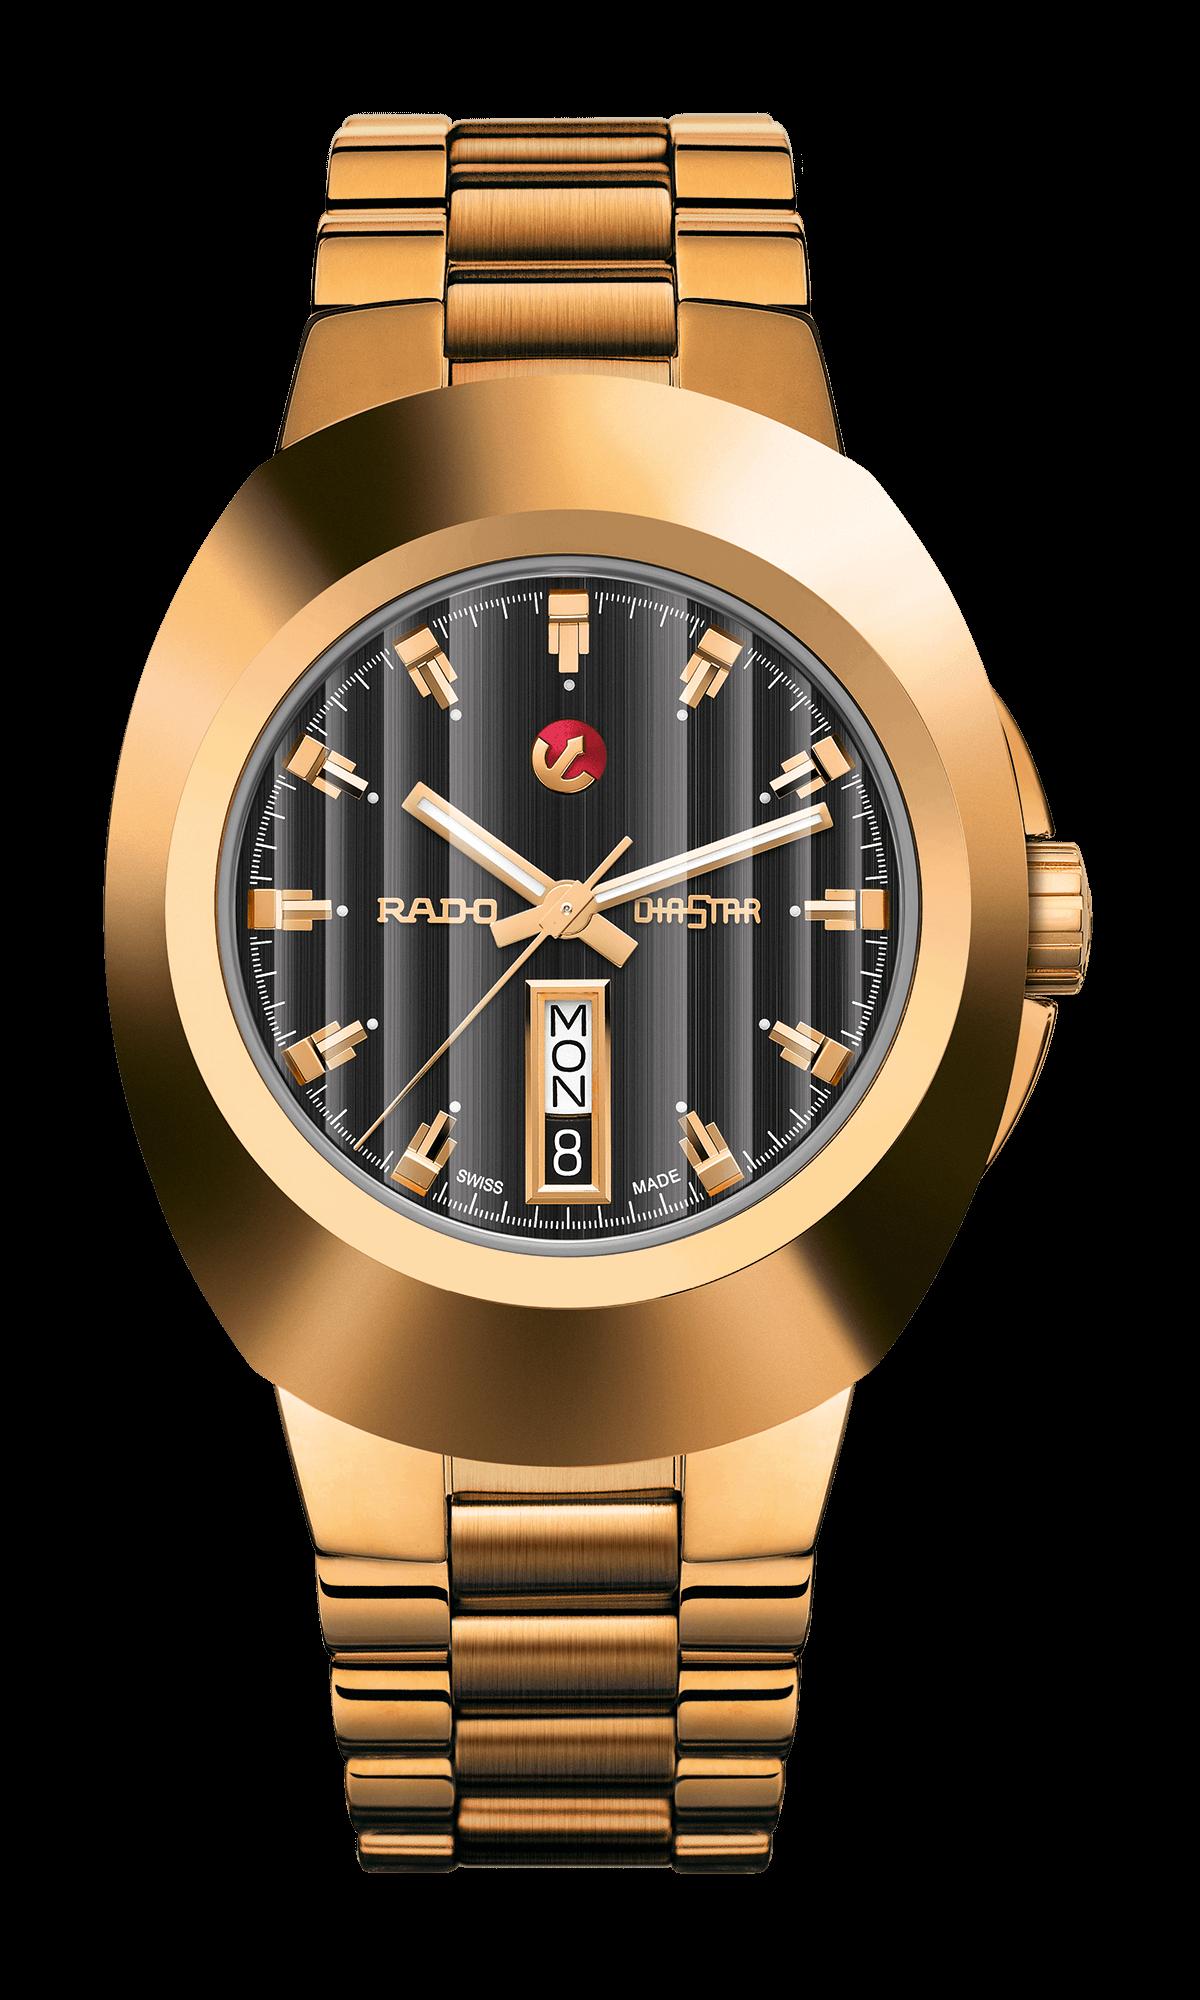 【RADO ラドー】New Original/スイスオーダー品 ニューオリジナル(ローズゴールド×ブラック)/国内正規品 腕時計